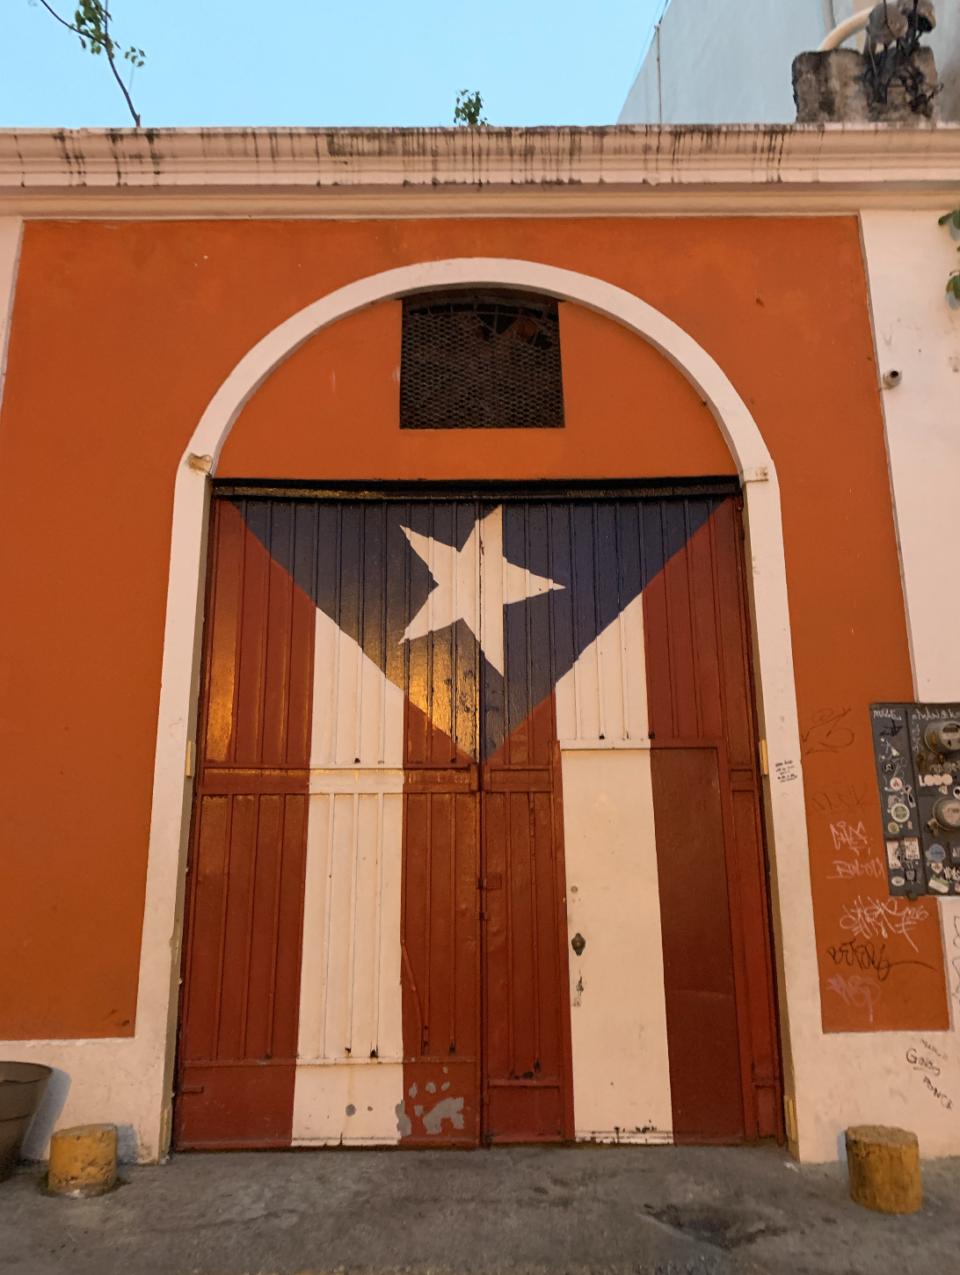 5 Days in Puerto Rico